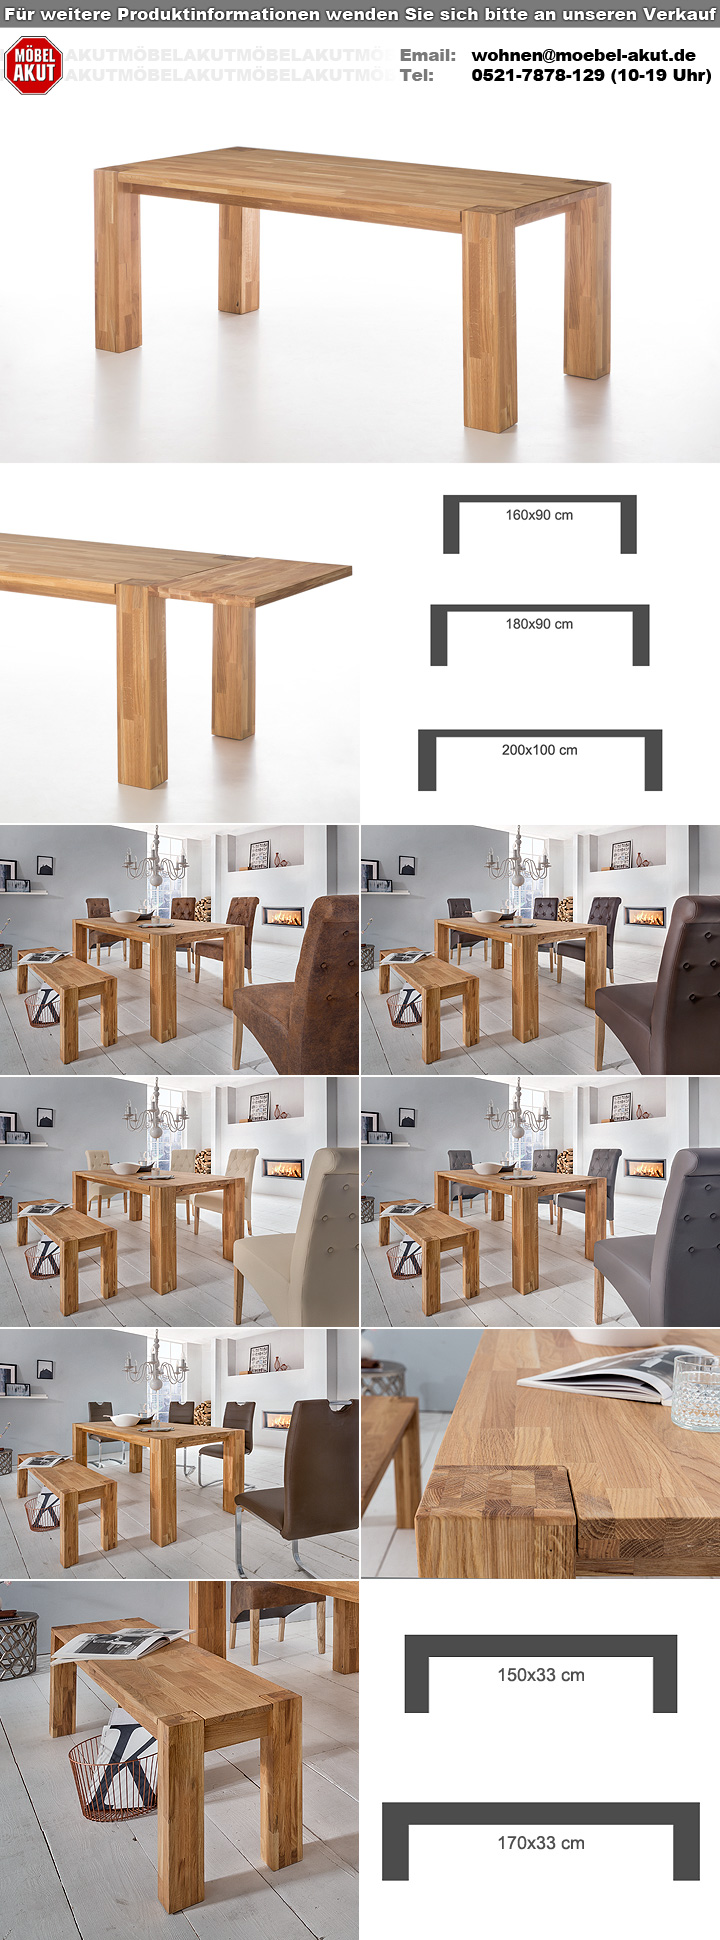 esstisch big oak in wildeiche massiv ge lt 200x100 cm. Black Bedroom Furniture Sets. Home Design Ideas